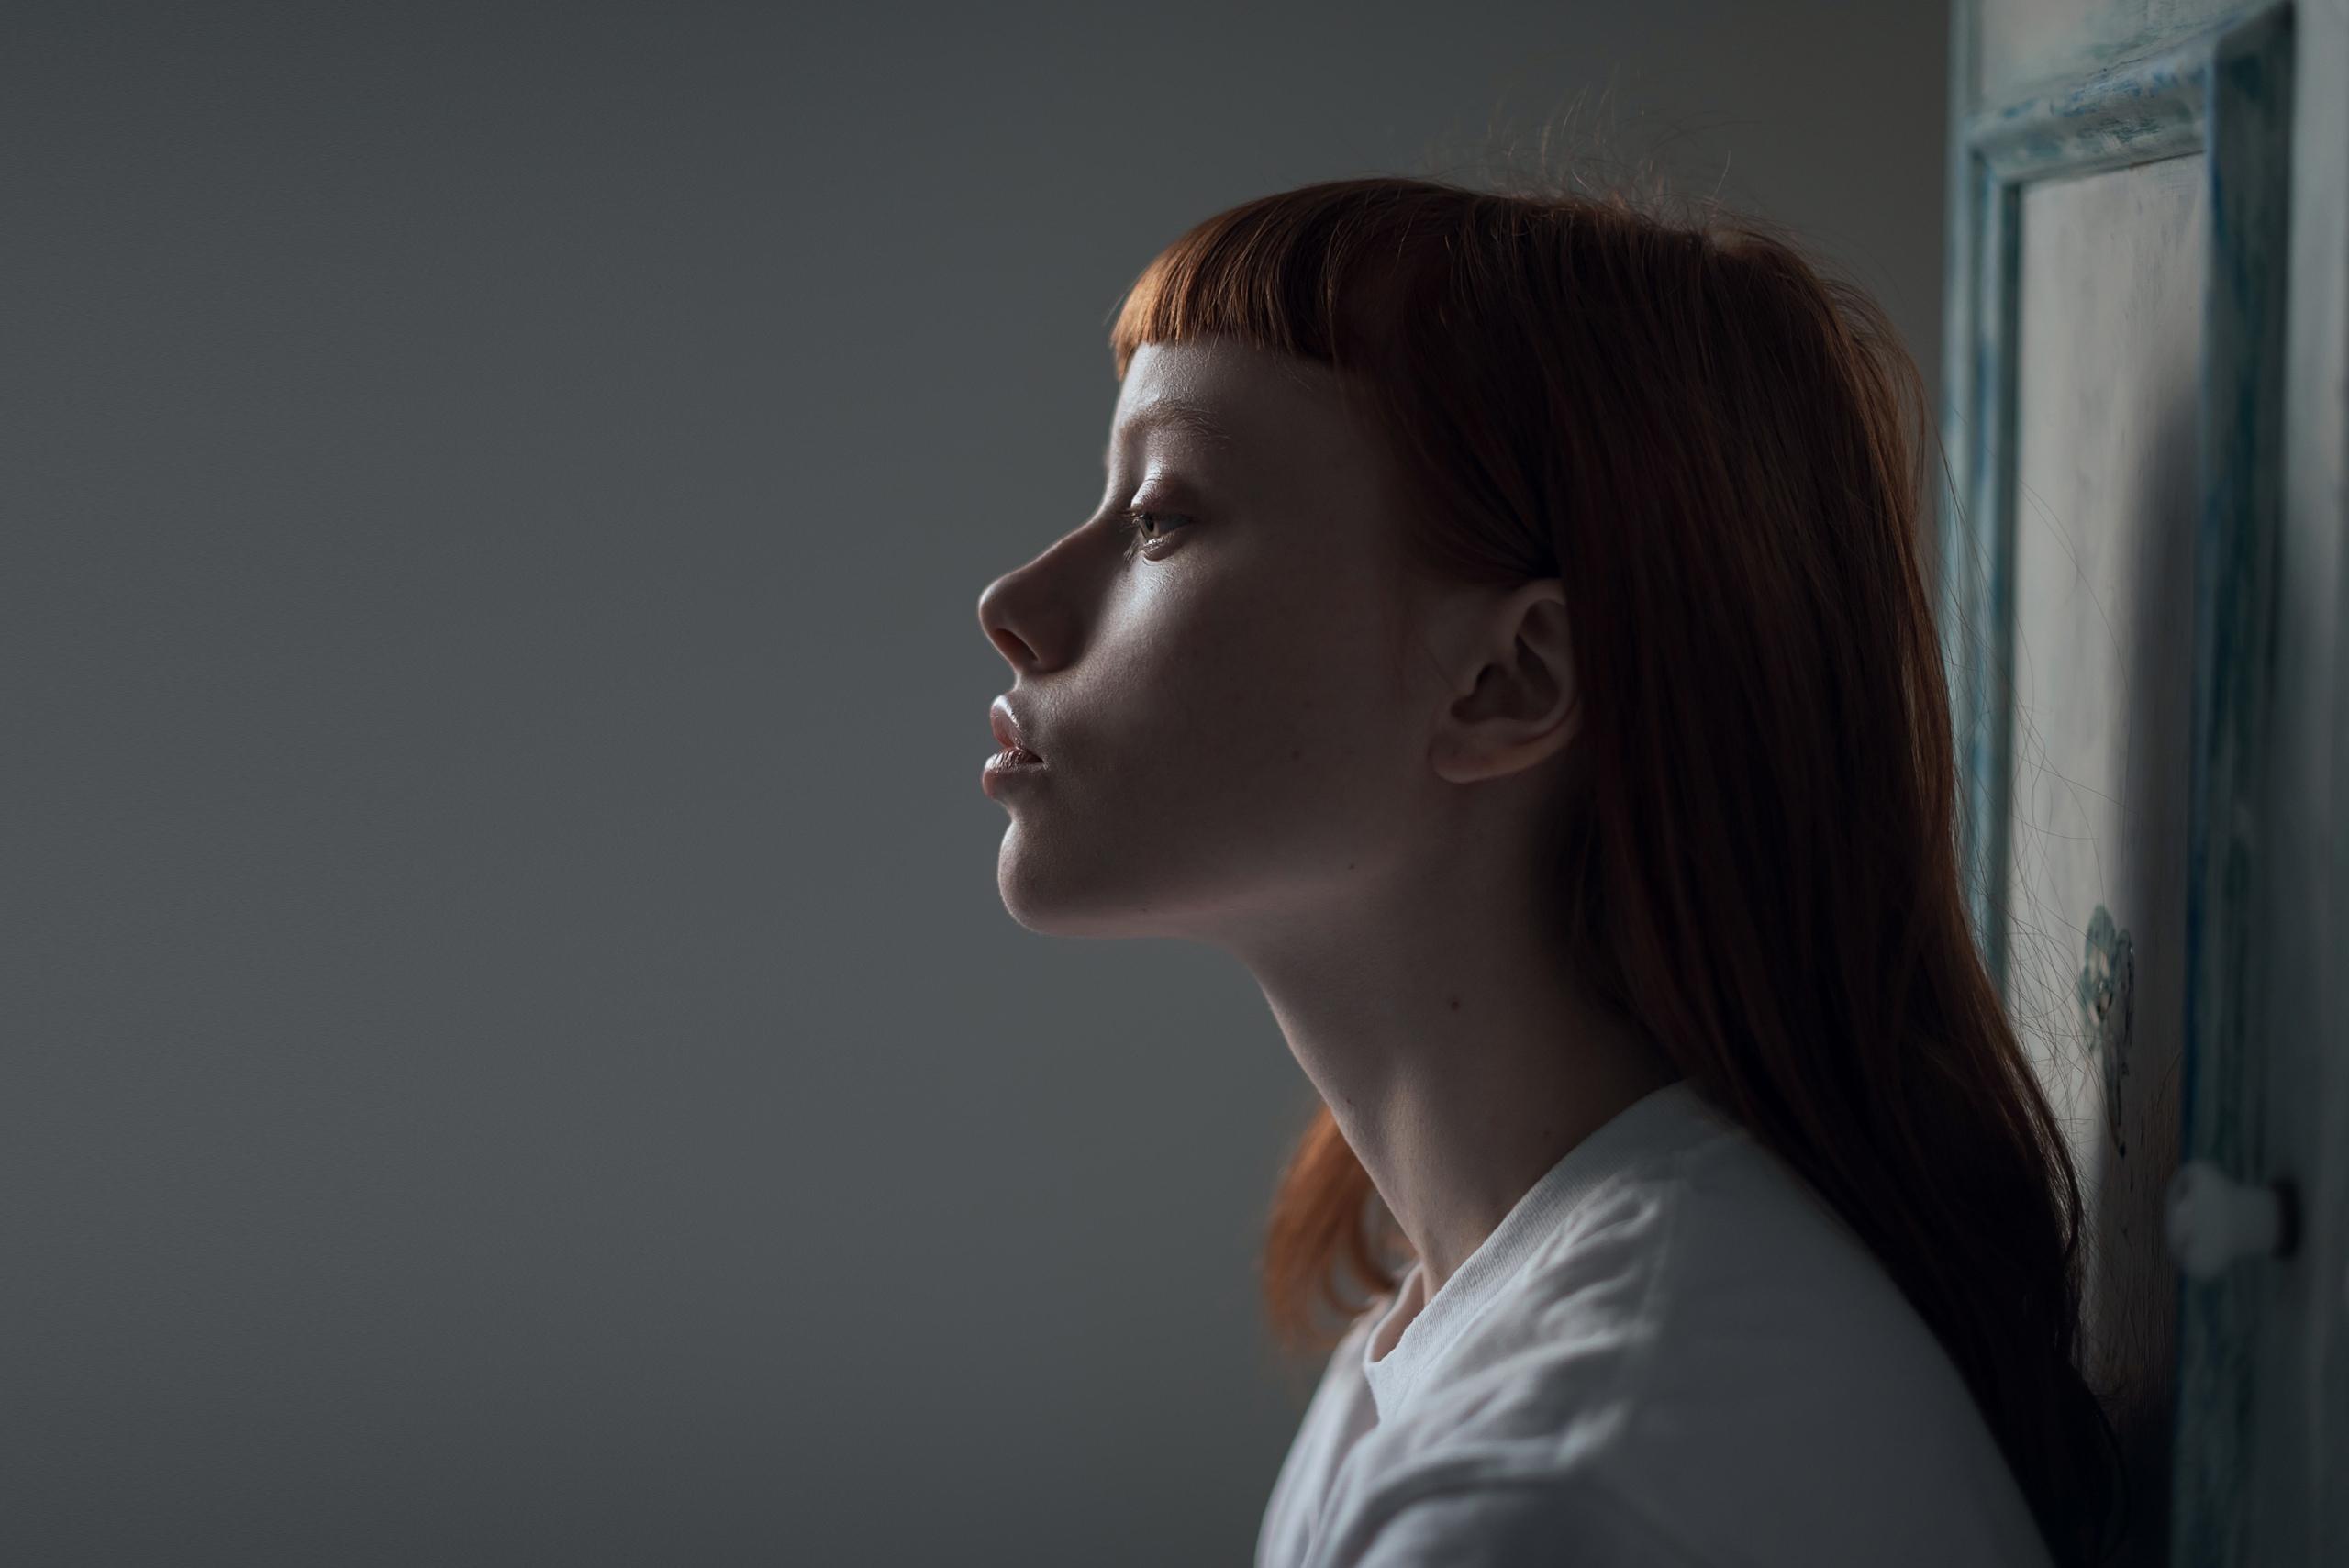 https://www.youngfolks.ru/pub/model-ulyana-naydenkova-33523217